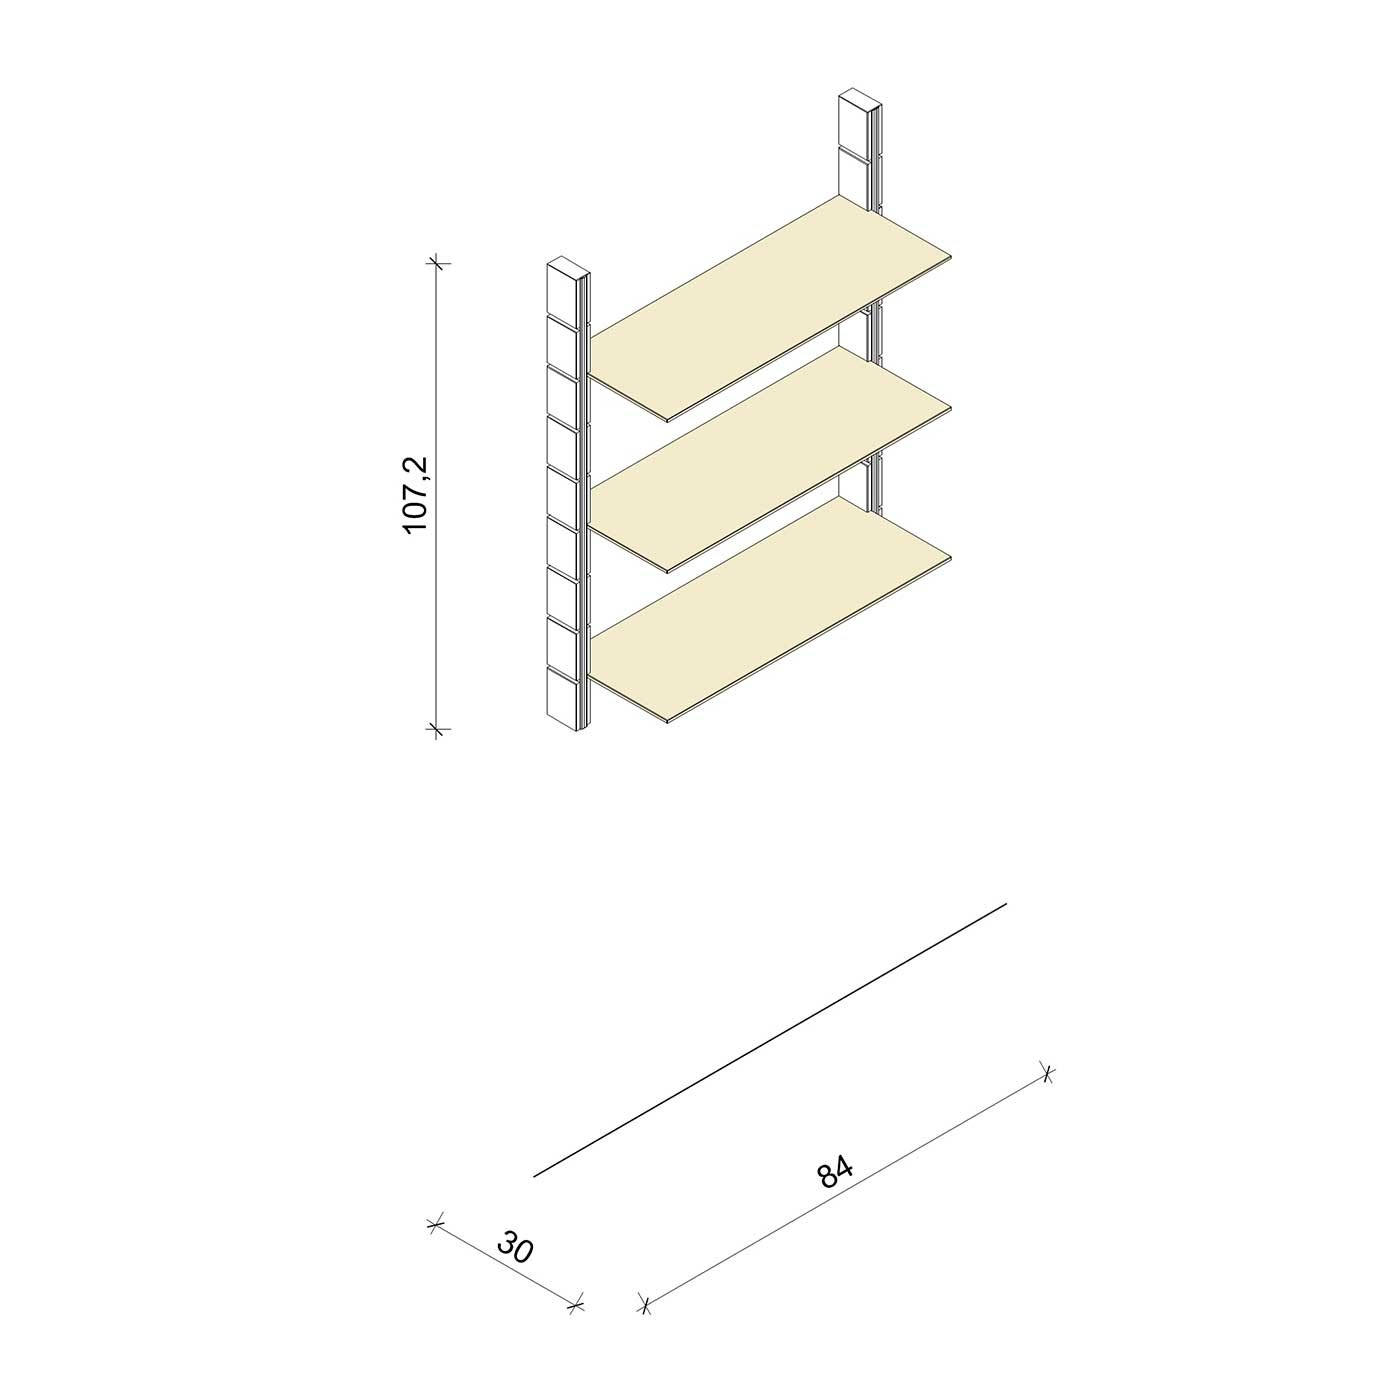 Bücherregal - Prime (M) 84 - Maß: 84 x 107,2 x 30 cm (B x H x T)